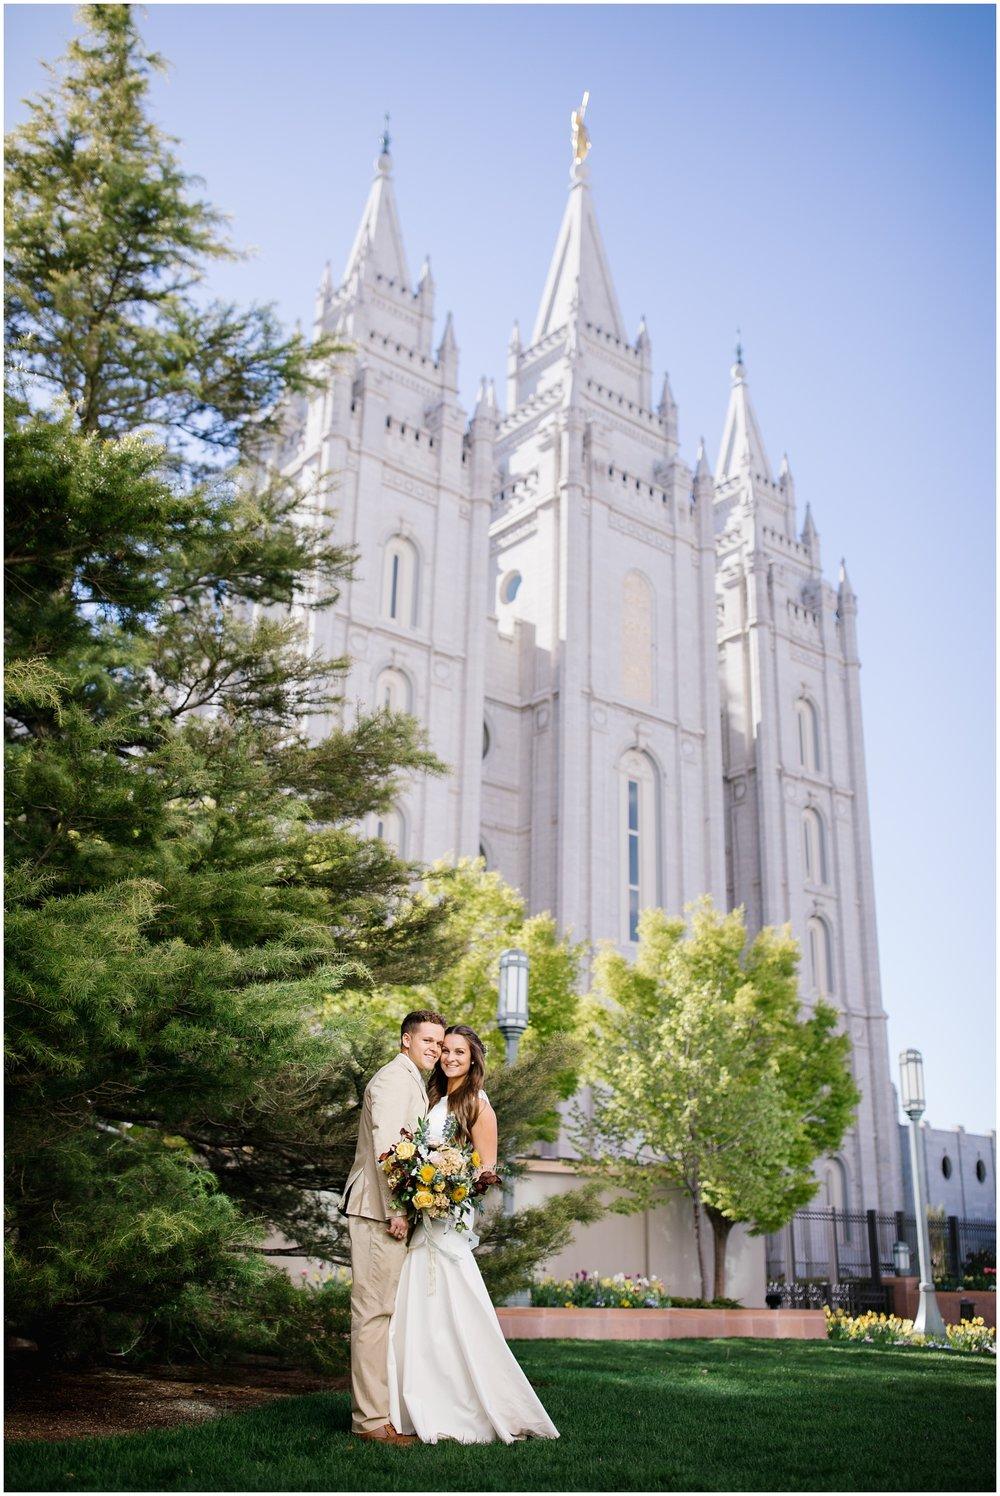 JC-Wedding-201_Lizzie-B-Imagery-Utah-Wedding-Photographer-Park-City-Salt-Lake-City-Temple-Joseph-Smith-Memorial-Building-Empire-Room.jpg